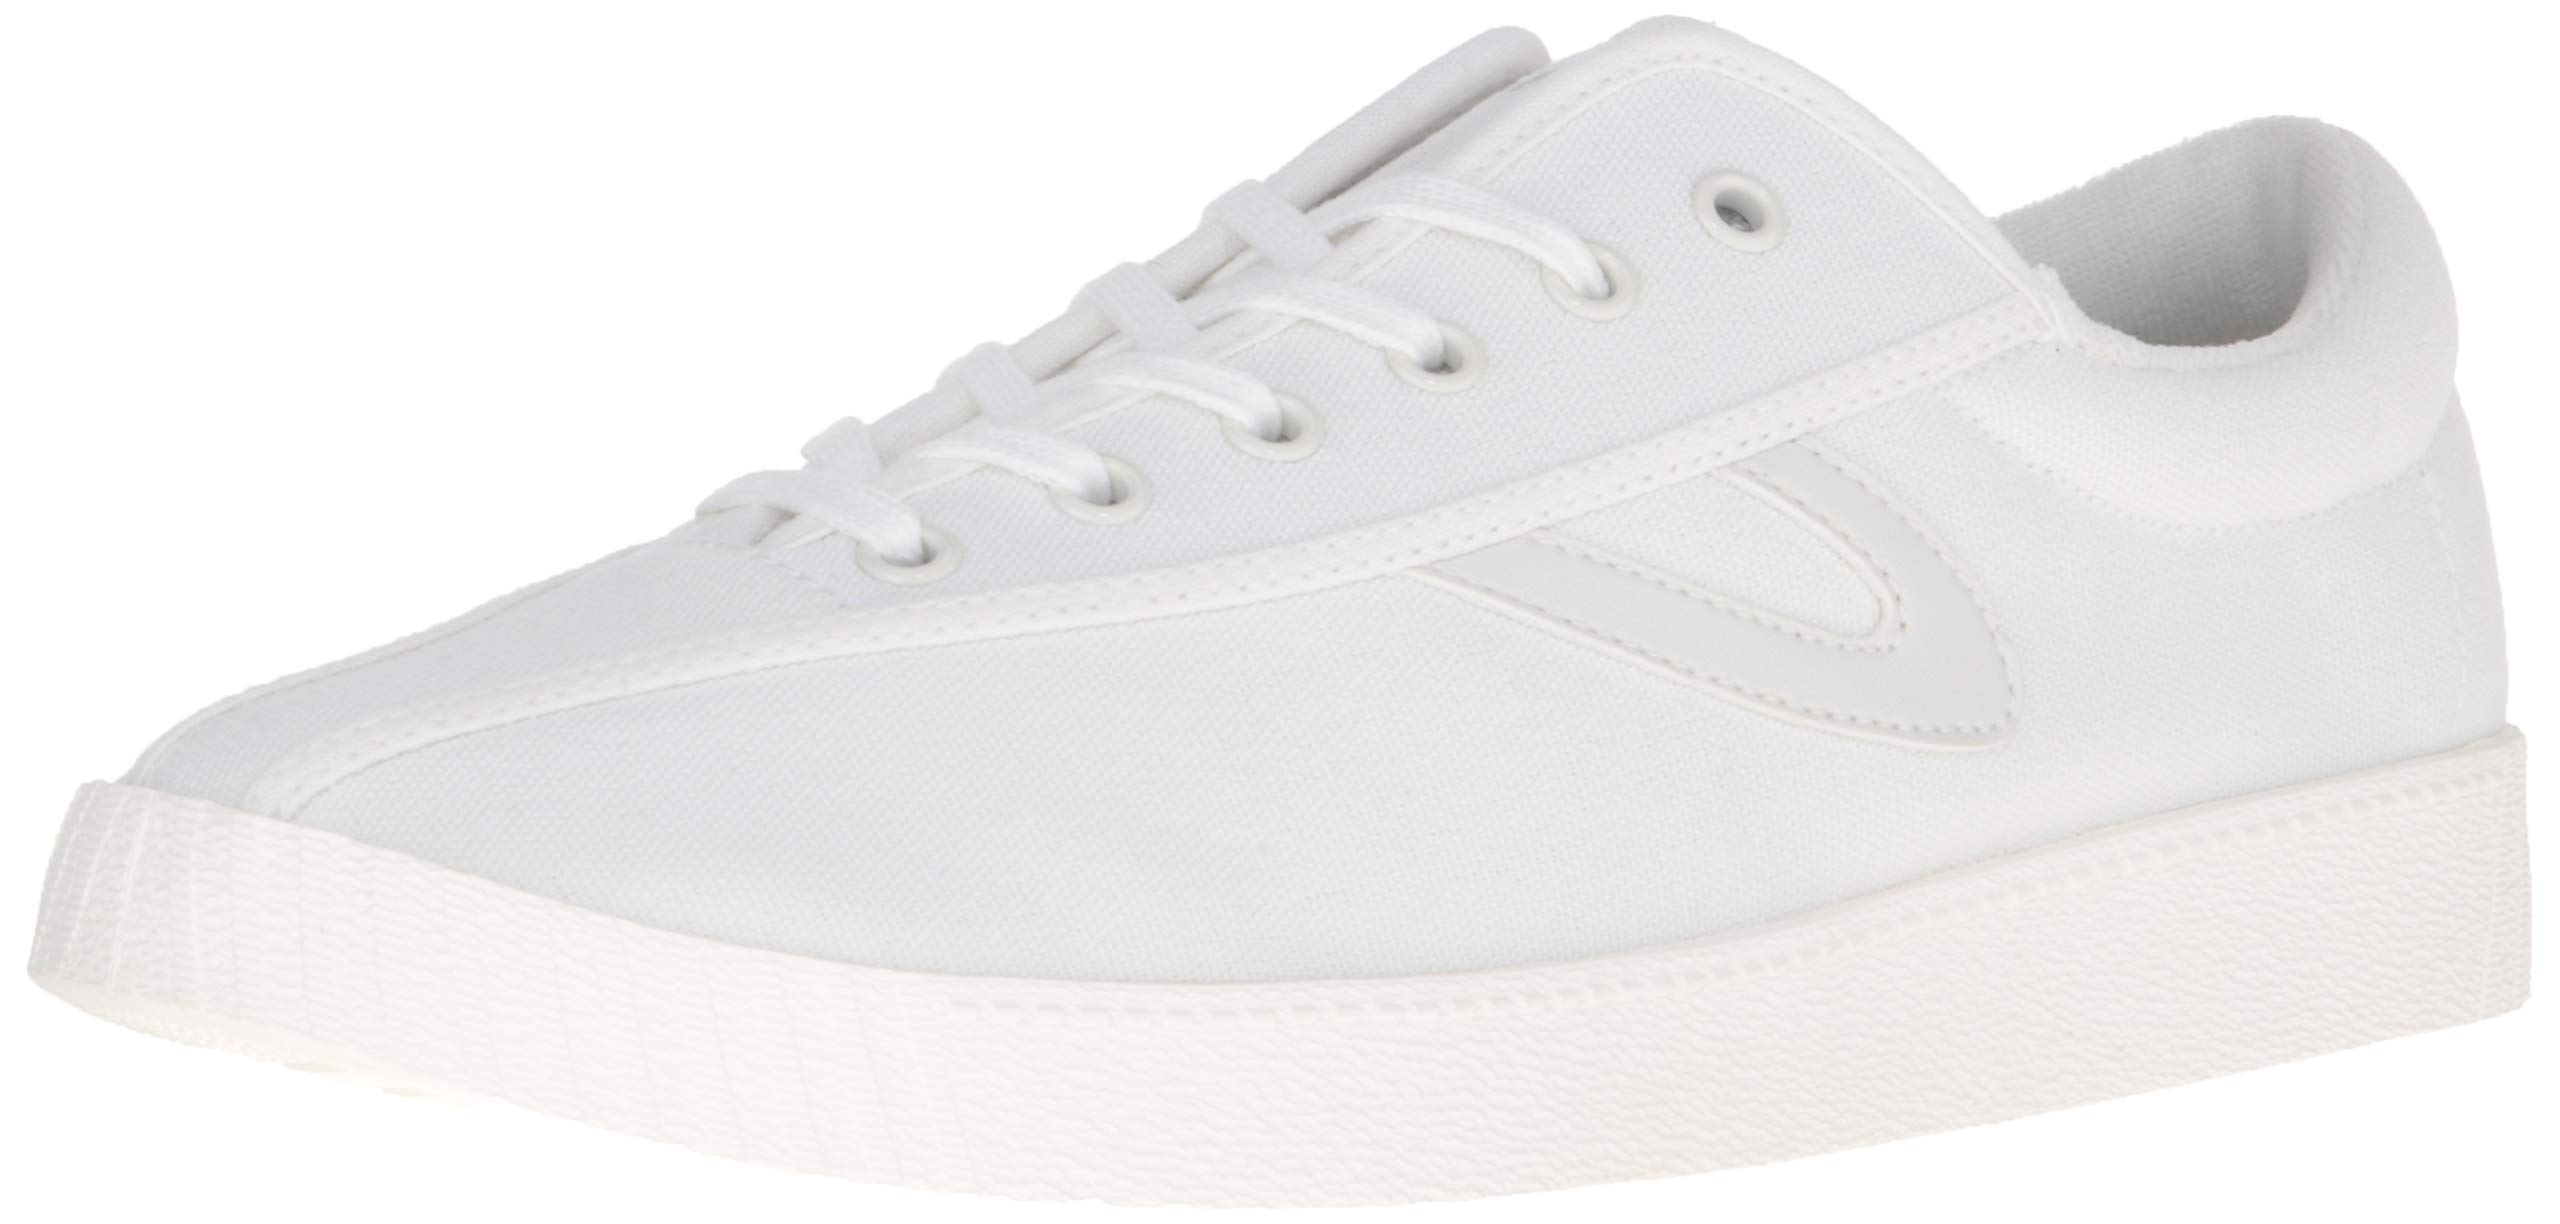 Tretorn Men's NYLITEPLUS Sneaker Vintage White, 9.5